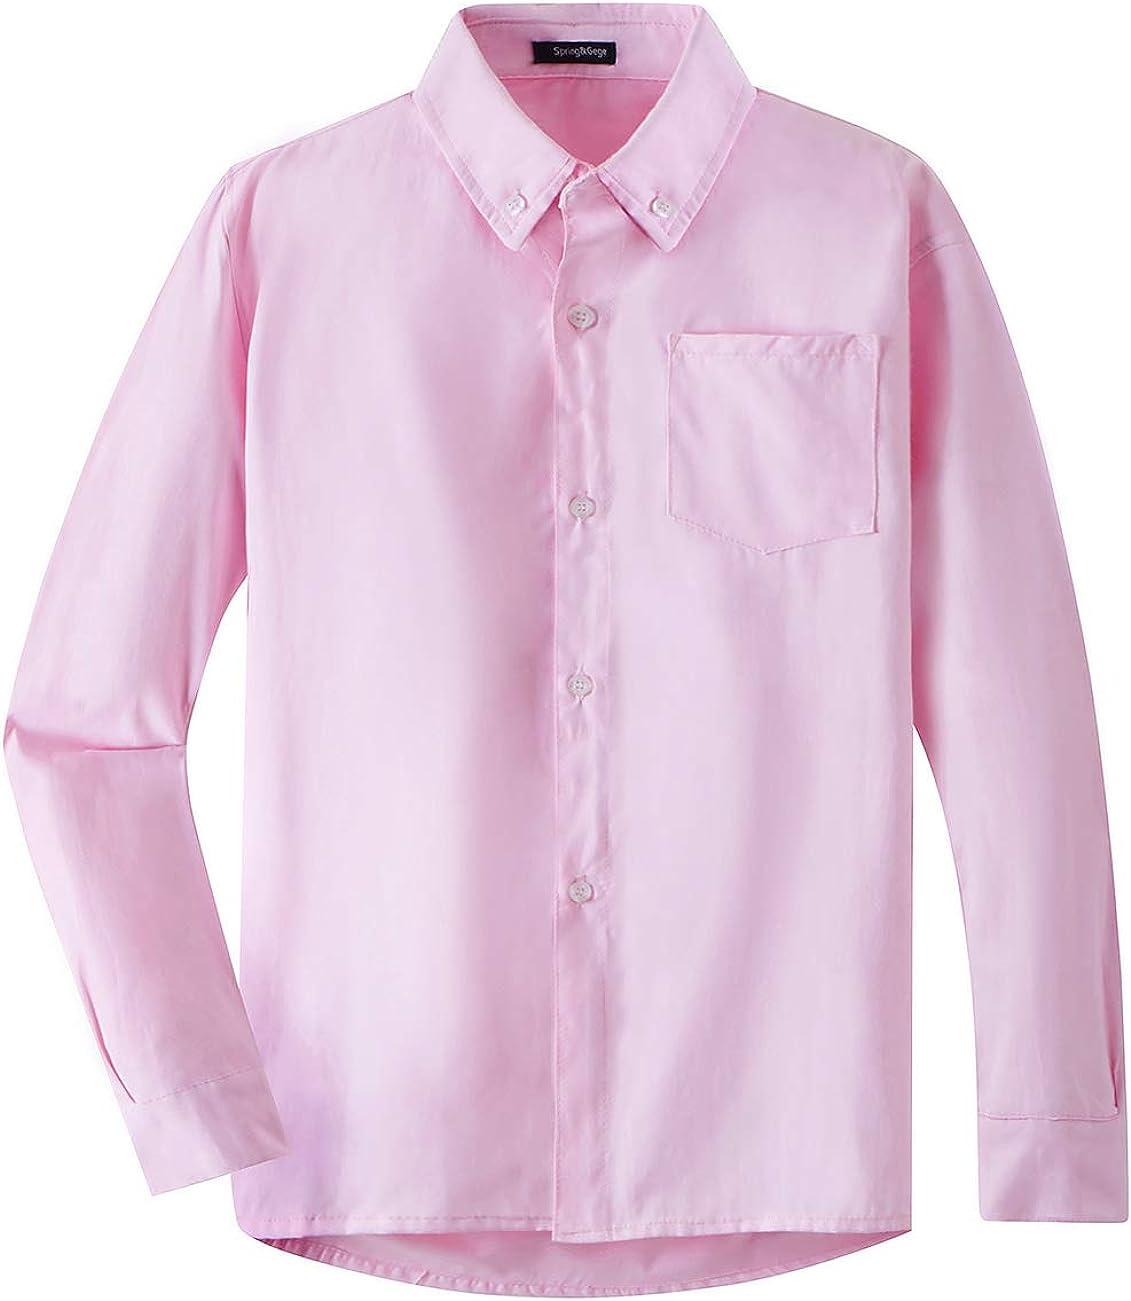 Spring&Gege Boys' Long Sleeve Uniform Oxford Dress Shirt Solid